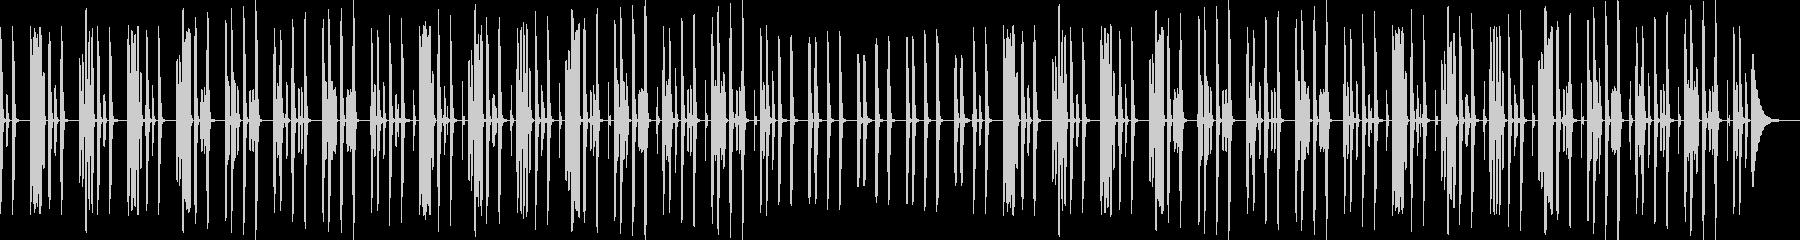 YouTube・リコーダー・ほのぼの日常の未再生の波形